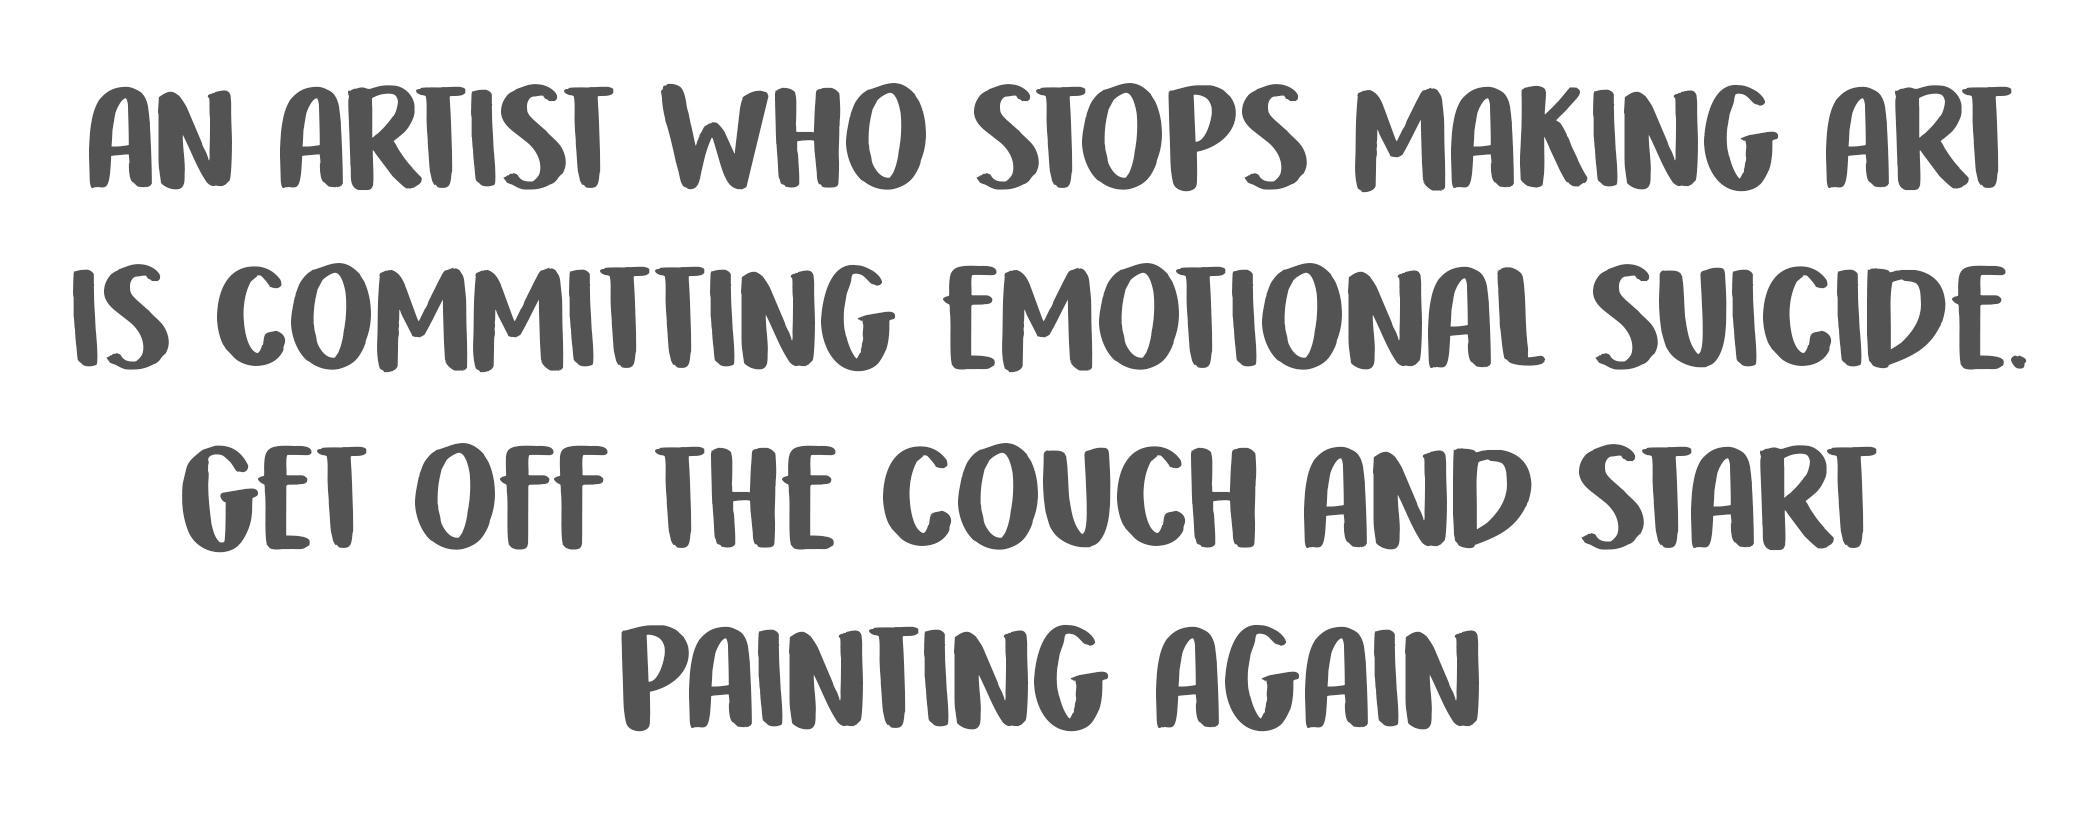 [Image] Emotional suicide